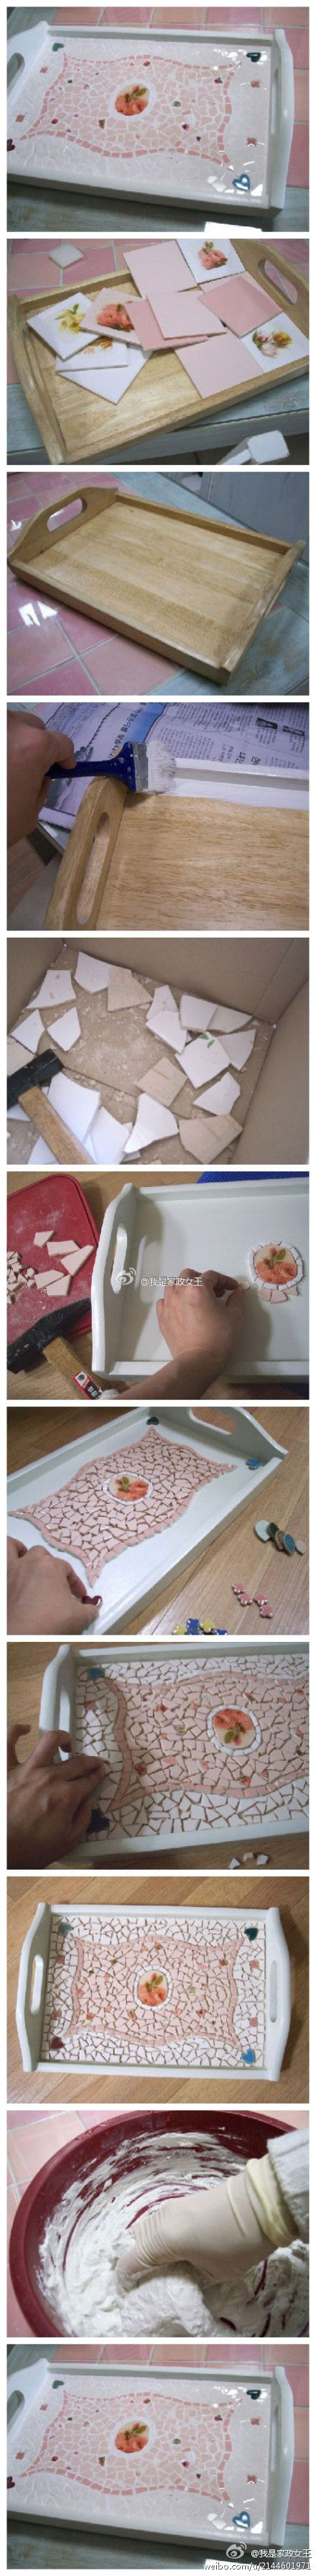 Mosaic table tray